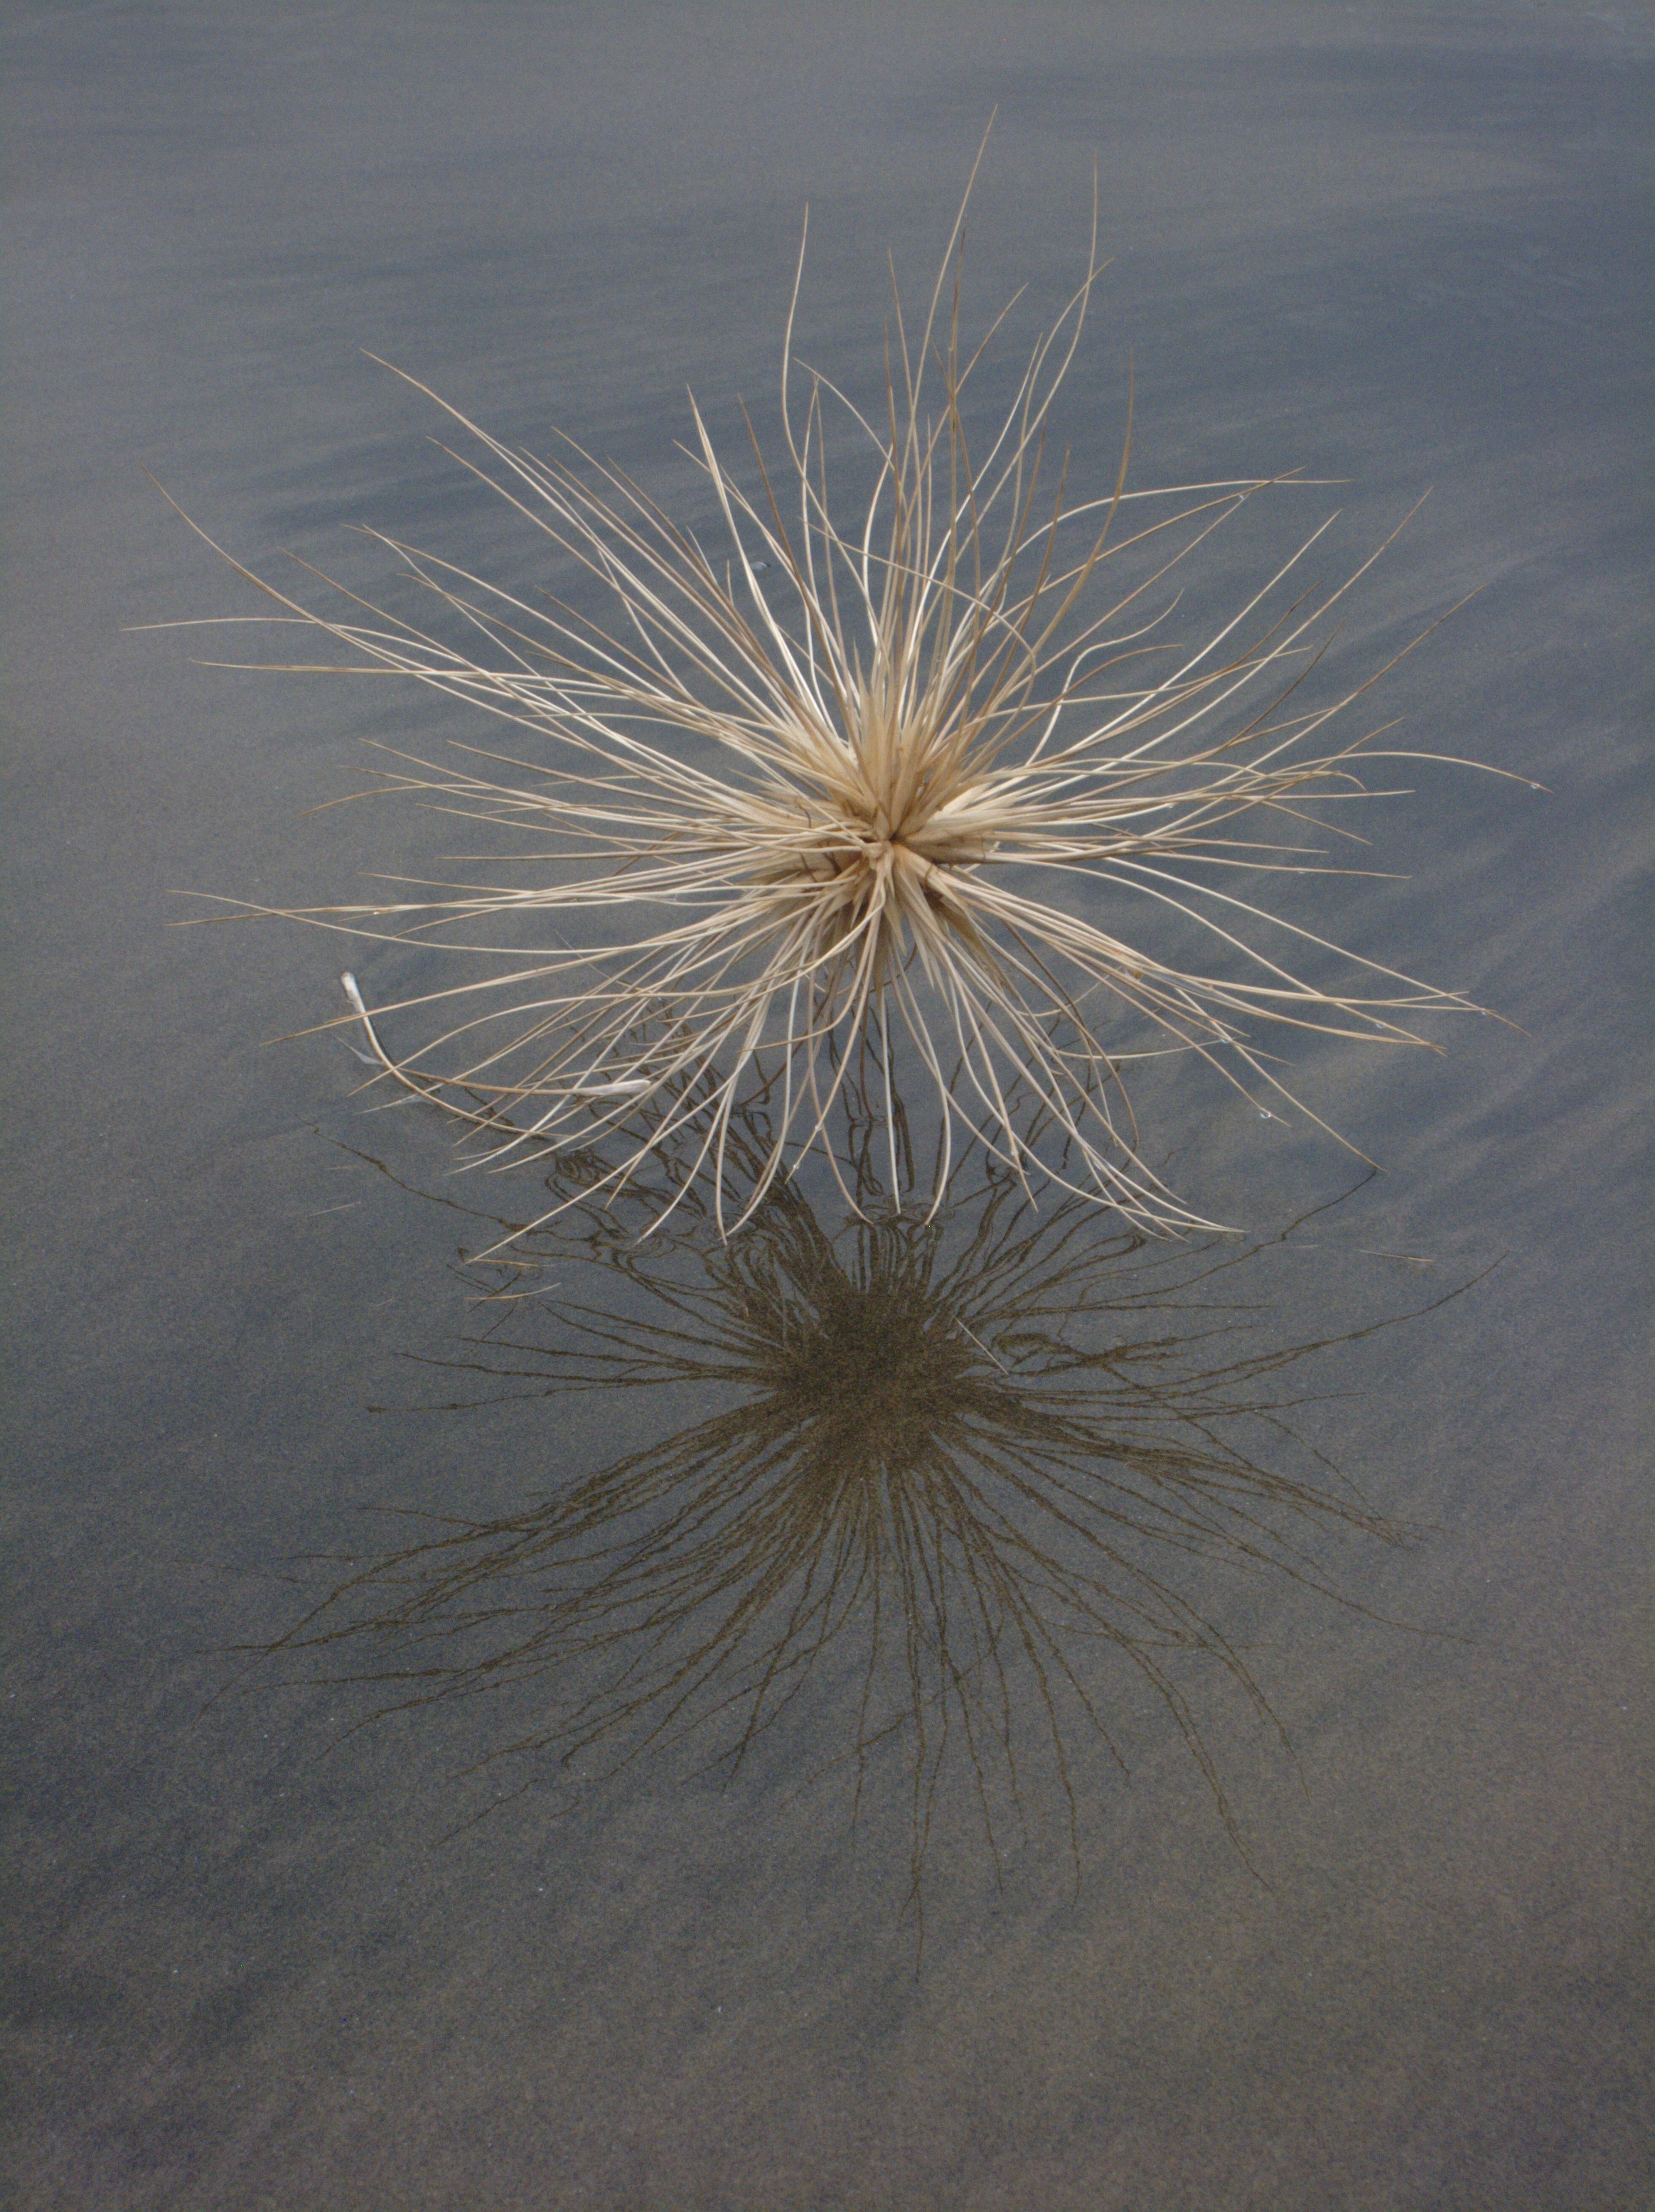 https://i0.wp.com/upload.wikimedia.org/wikipedia/commons/6/6a/Spinifex_sericeus_seed_head.jpg